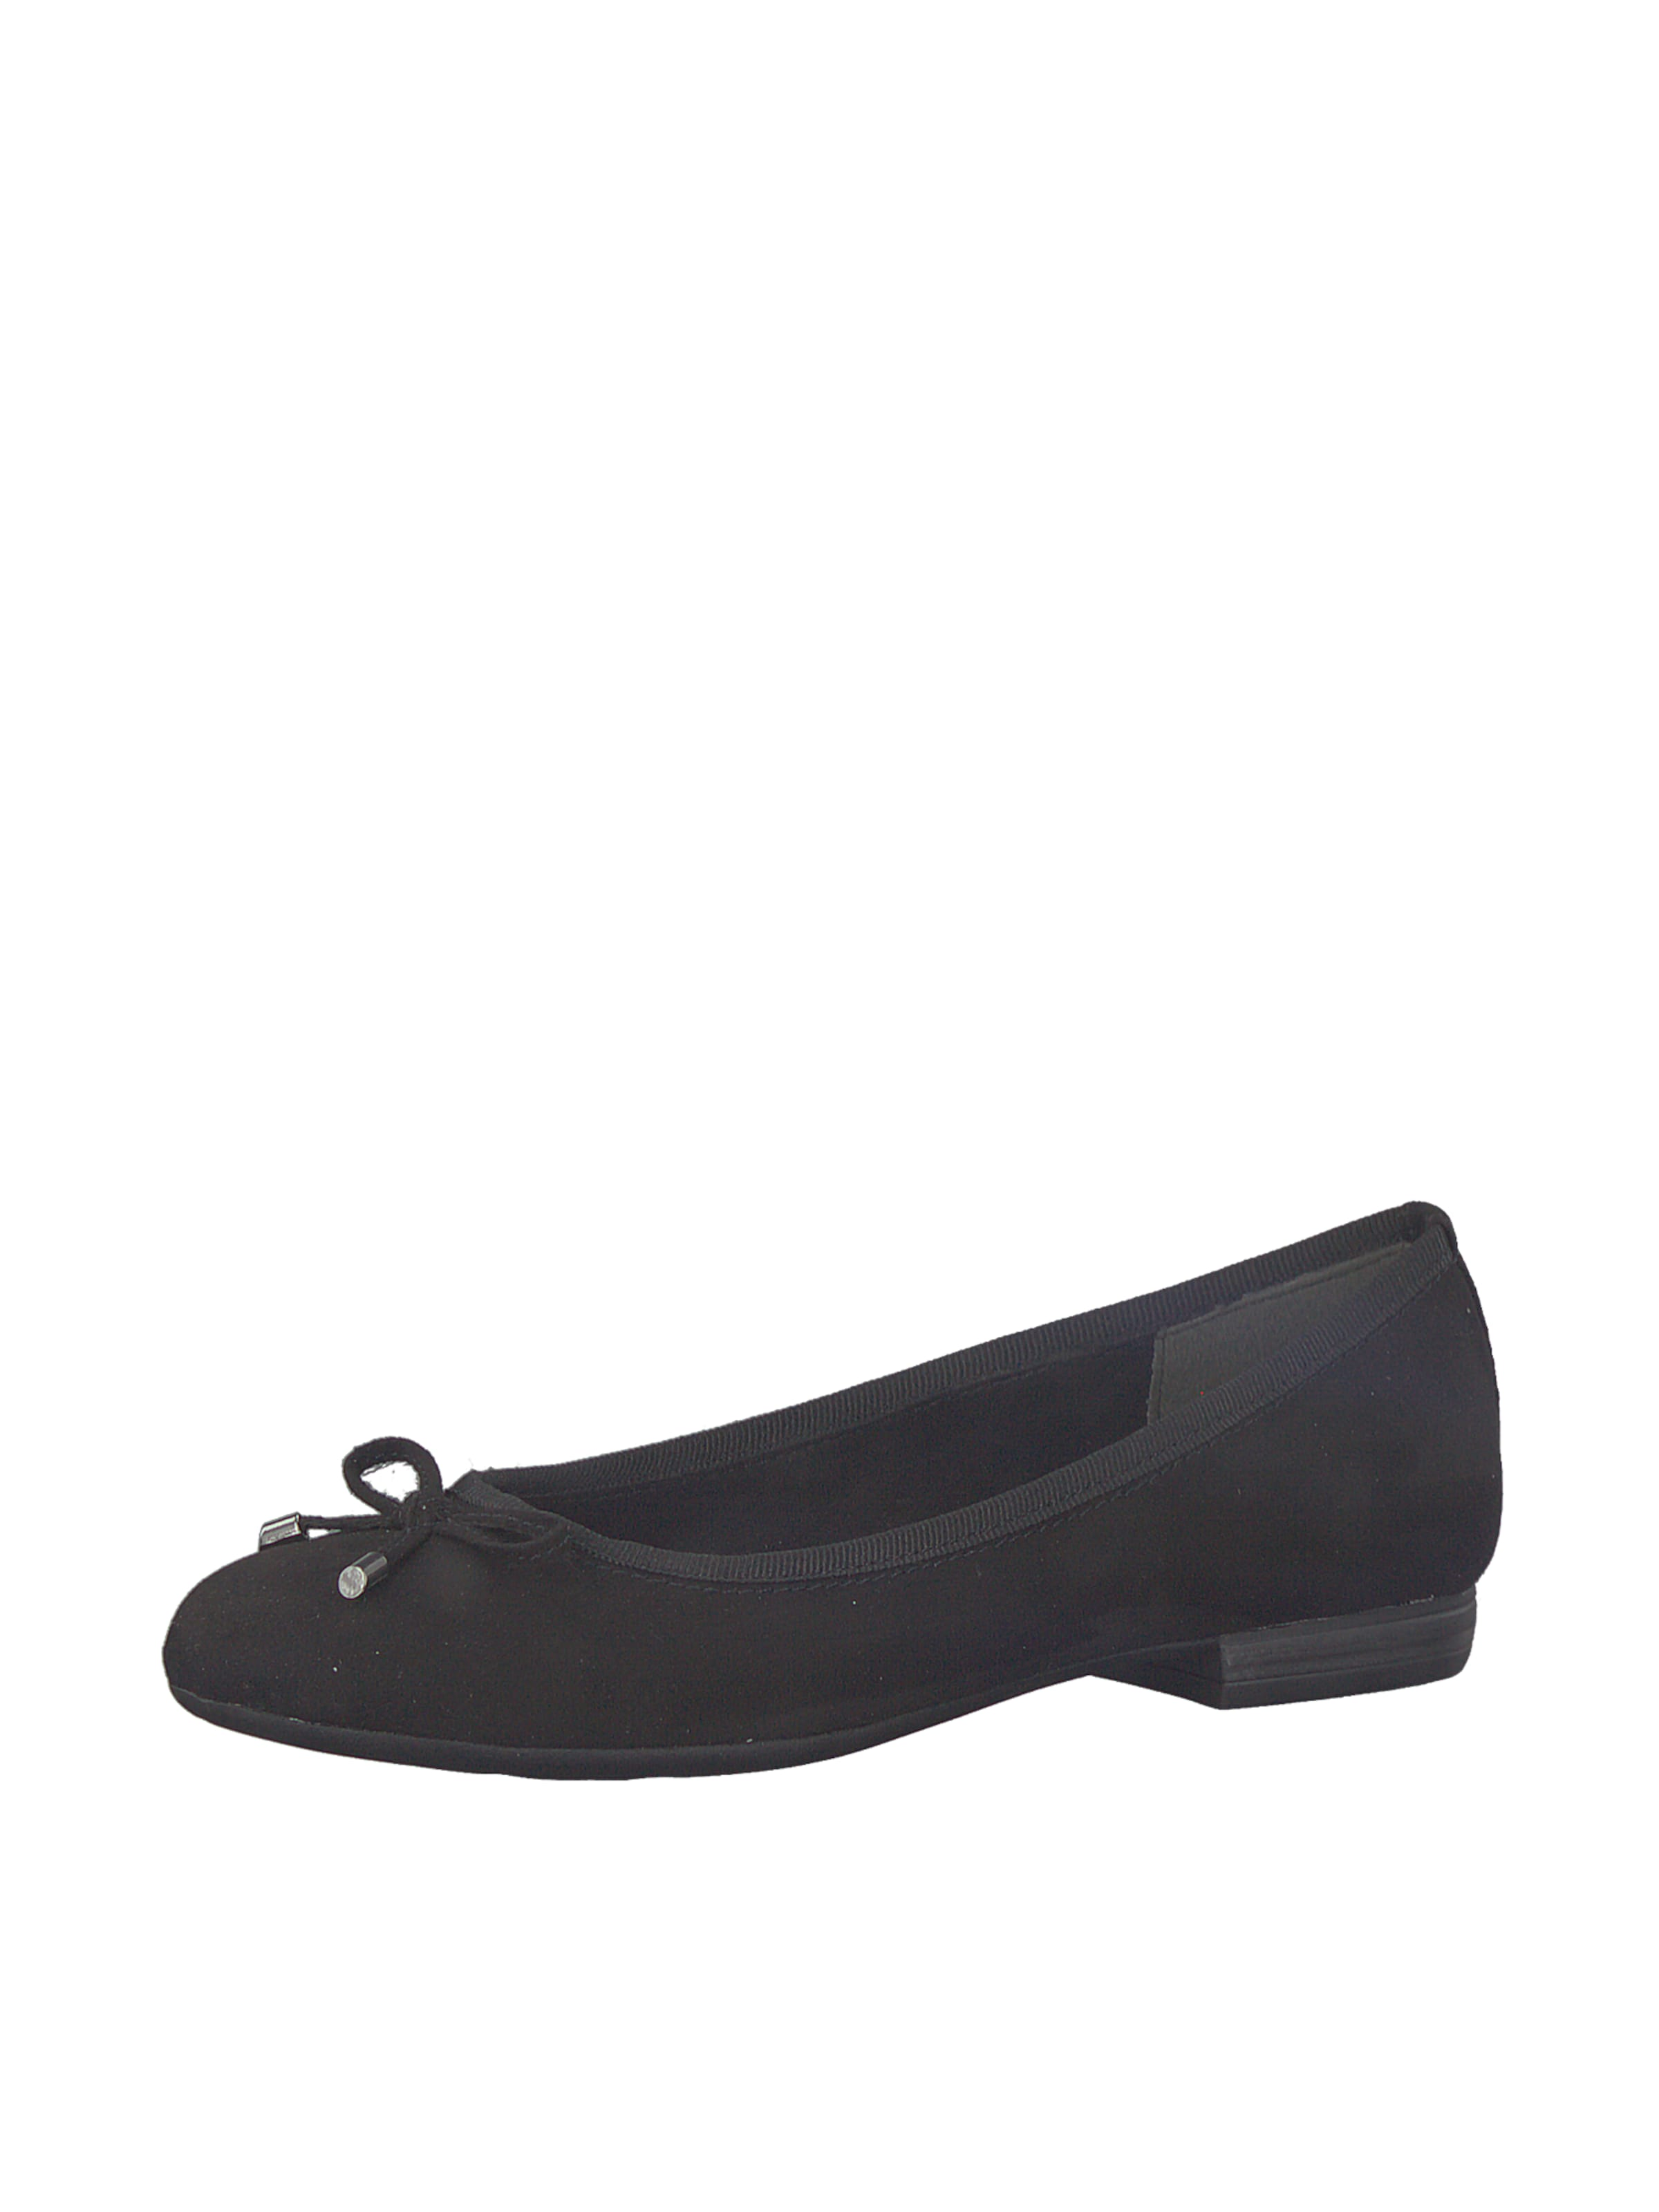 MARCO TOZZI Ballerinas in schwarz